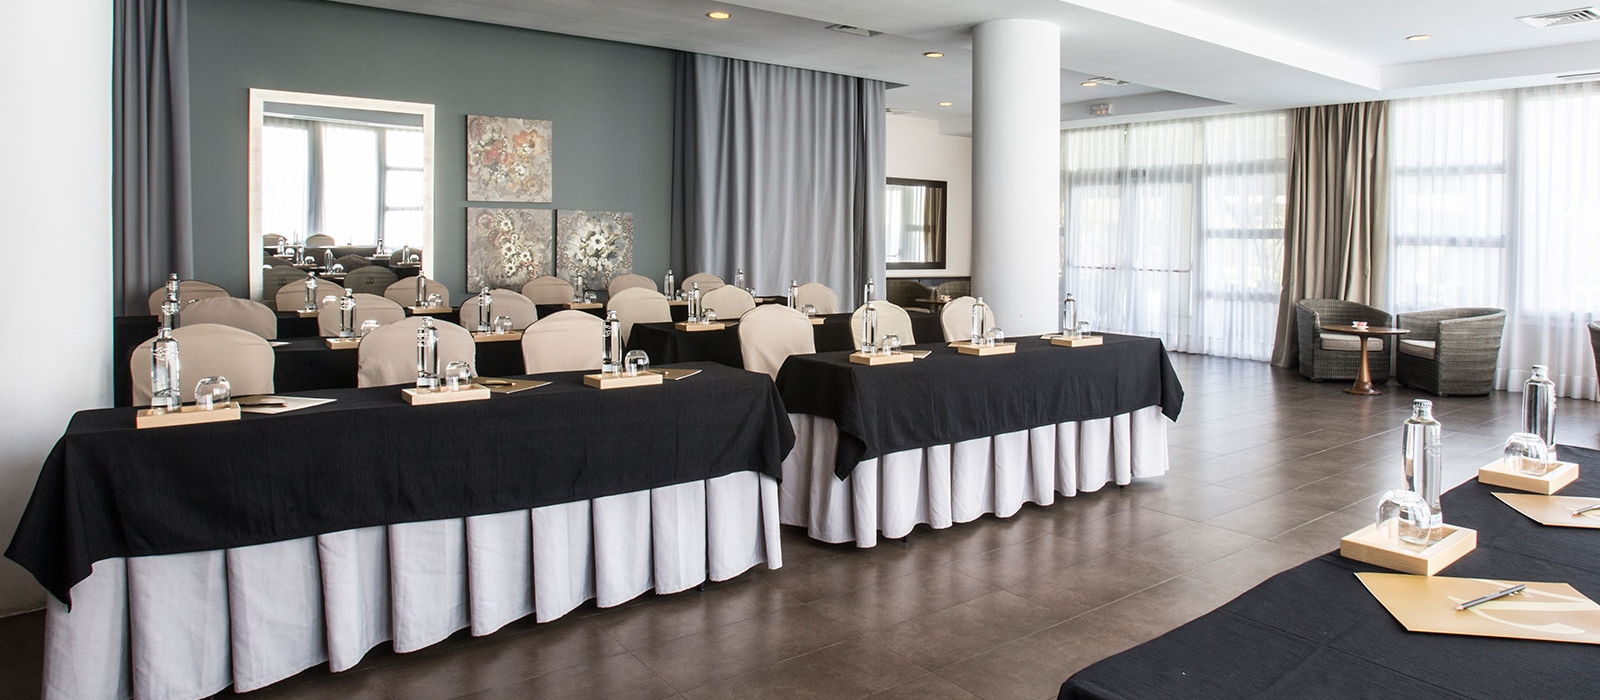 Servicios Hotel Cádiz Costa Golf - Vincci Hoteles - Salones